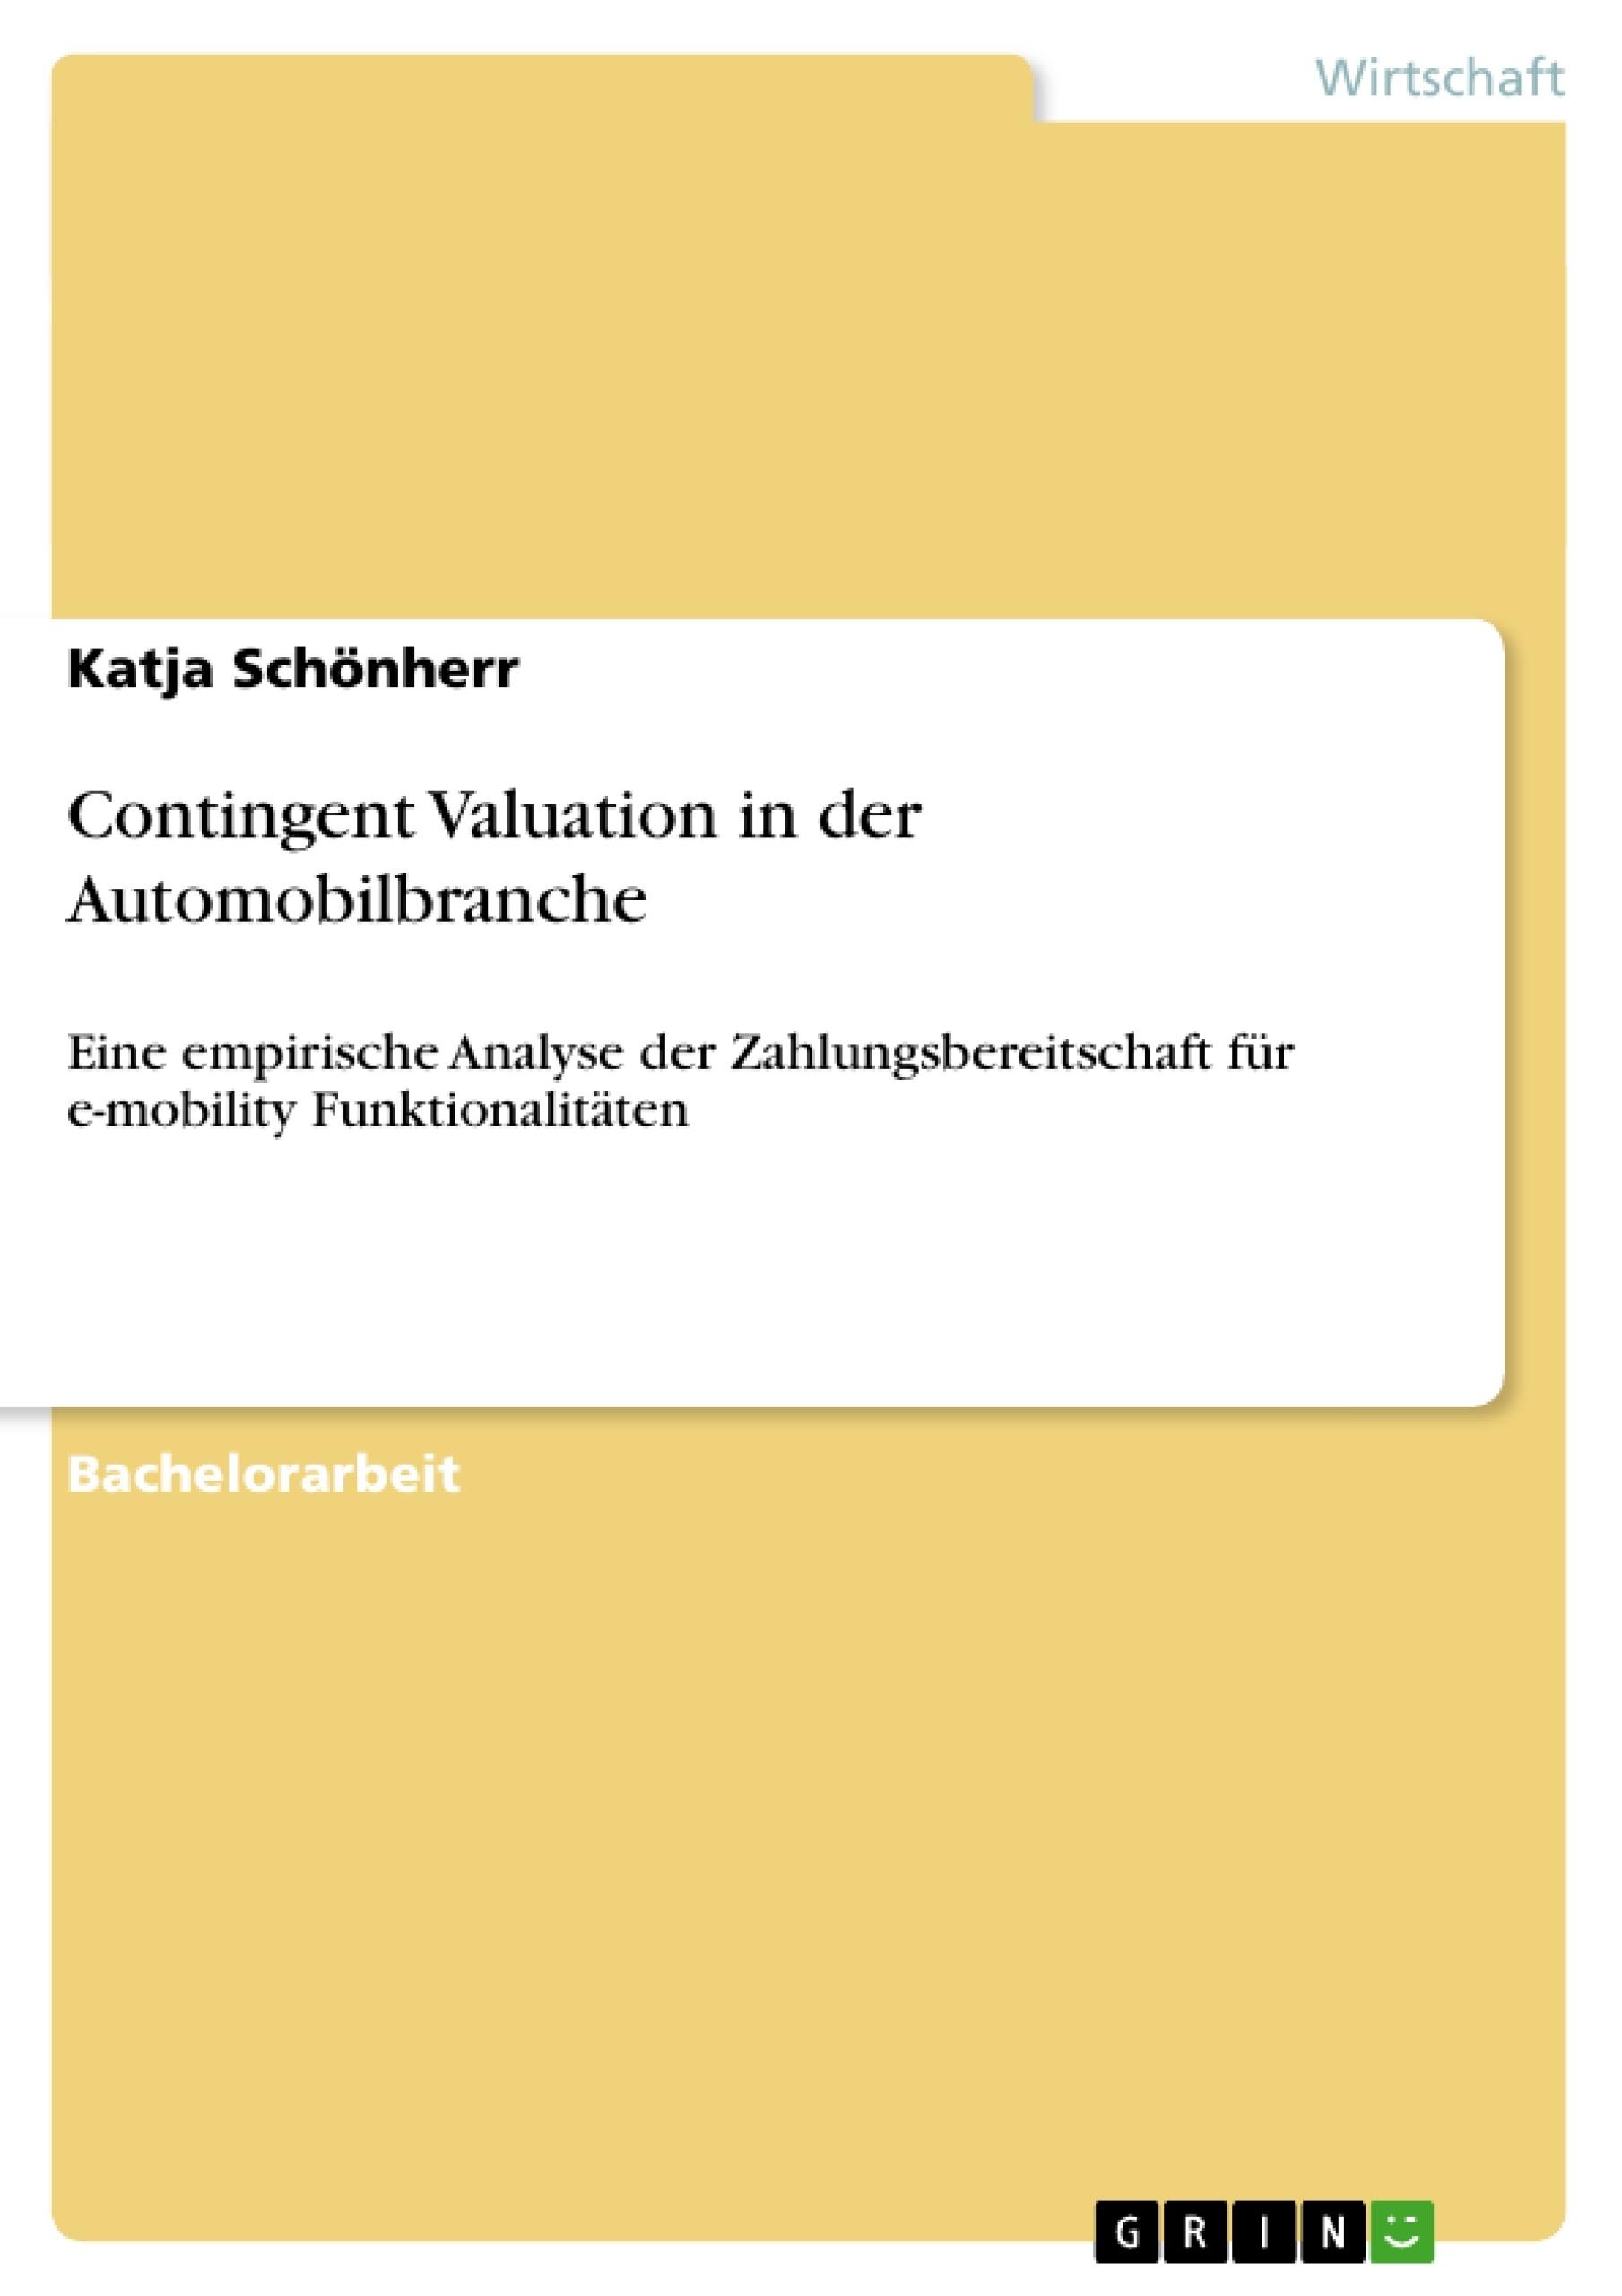 Titel: Contingent Valuation in der Automobilbranche